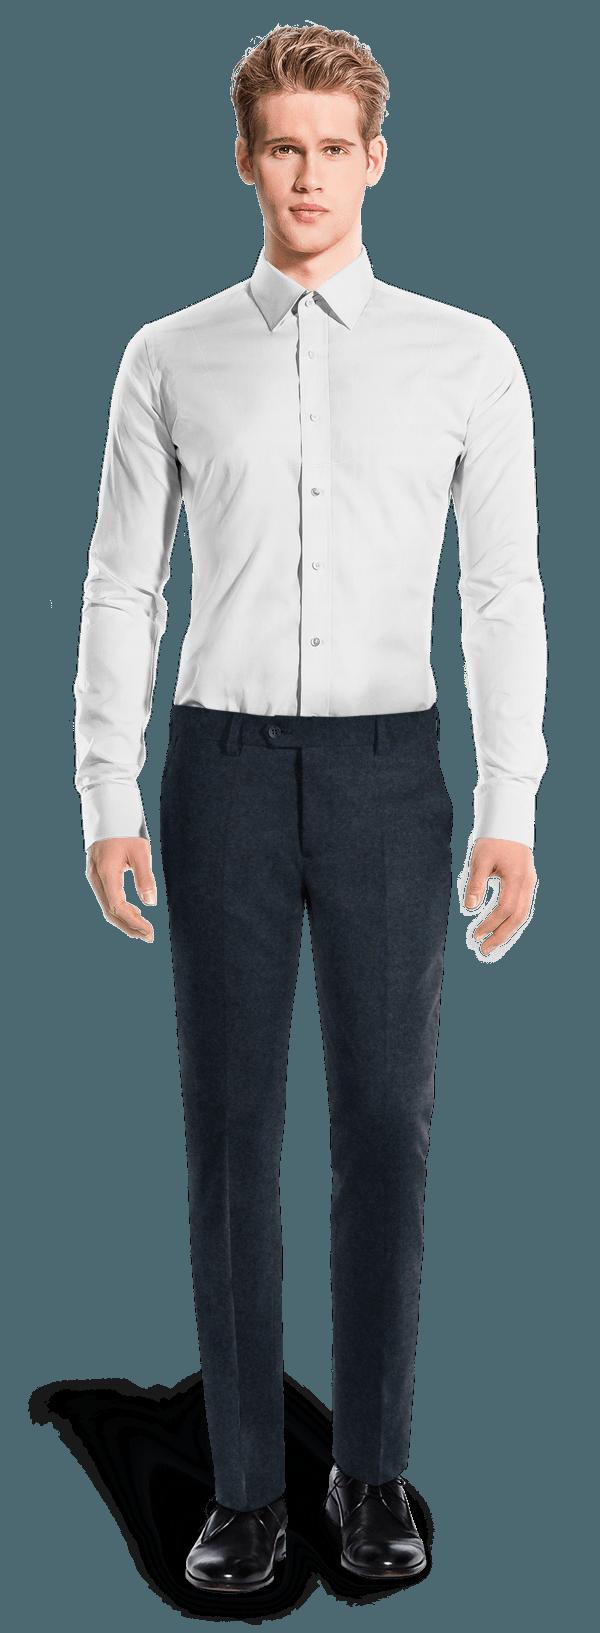 Pantalon bleu coupe cintrée en tweed